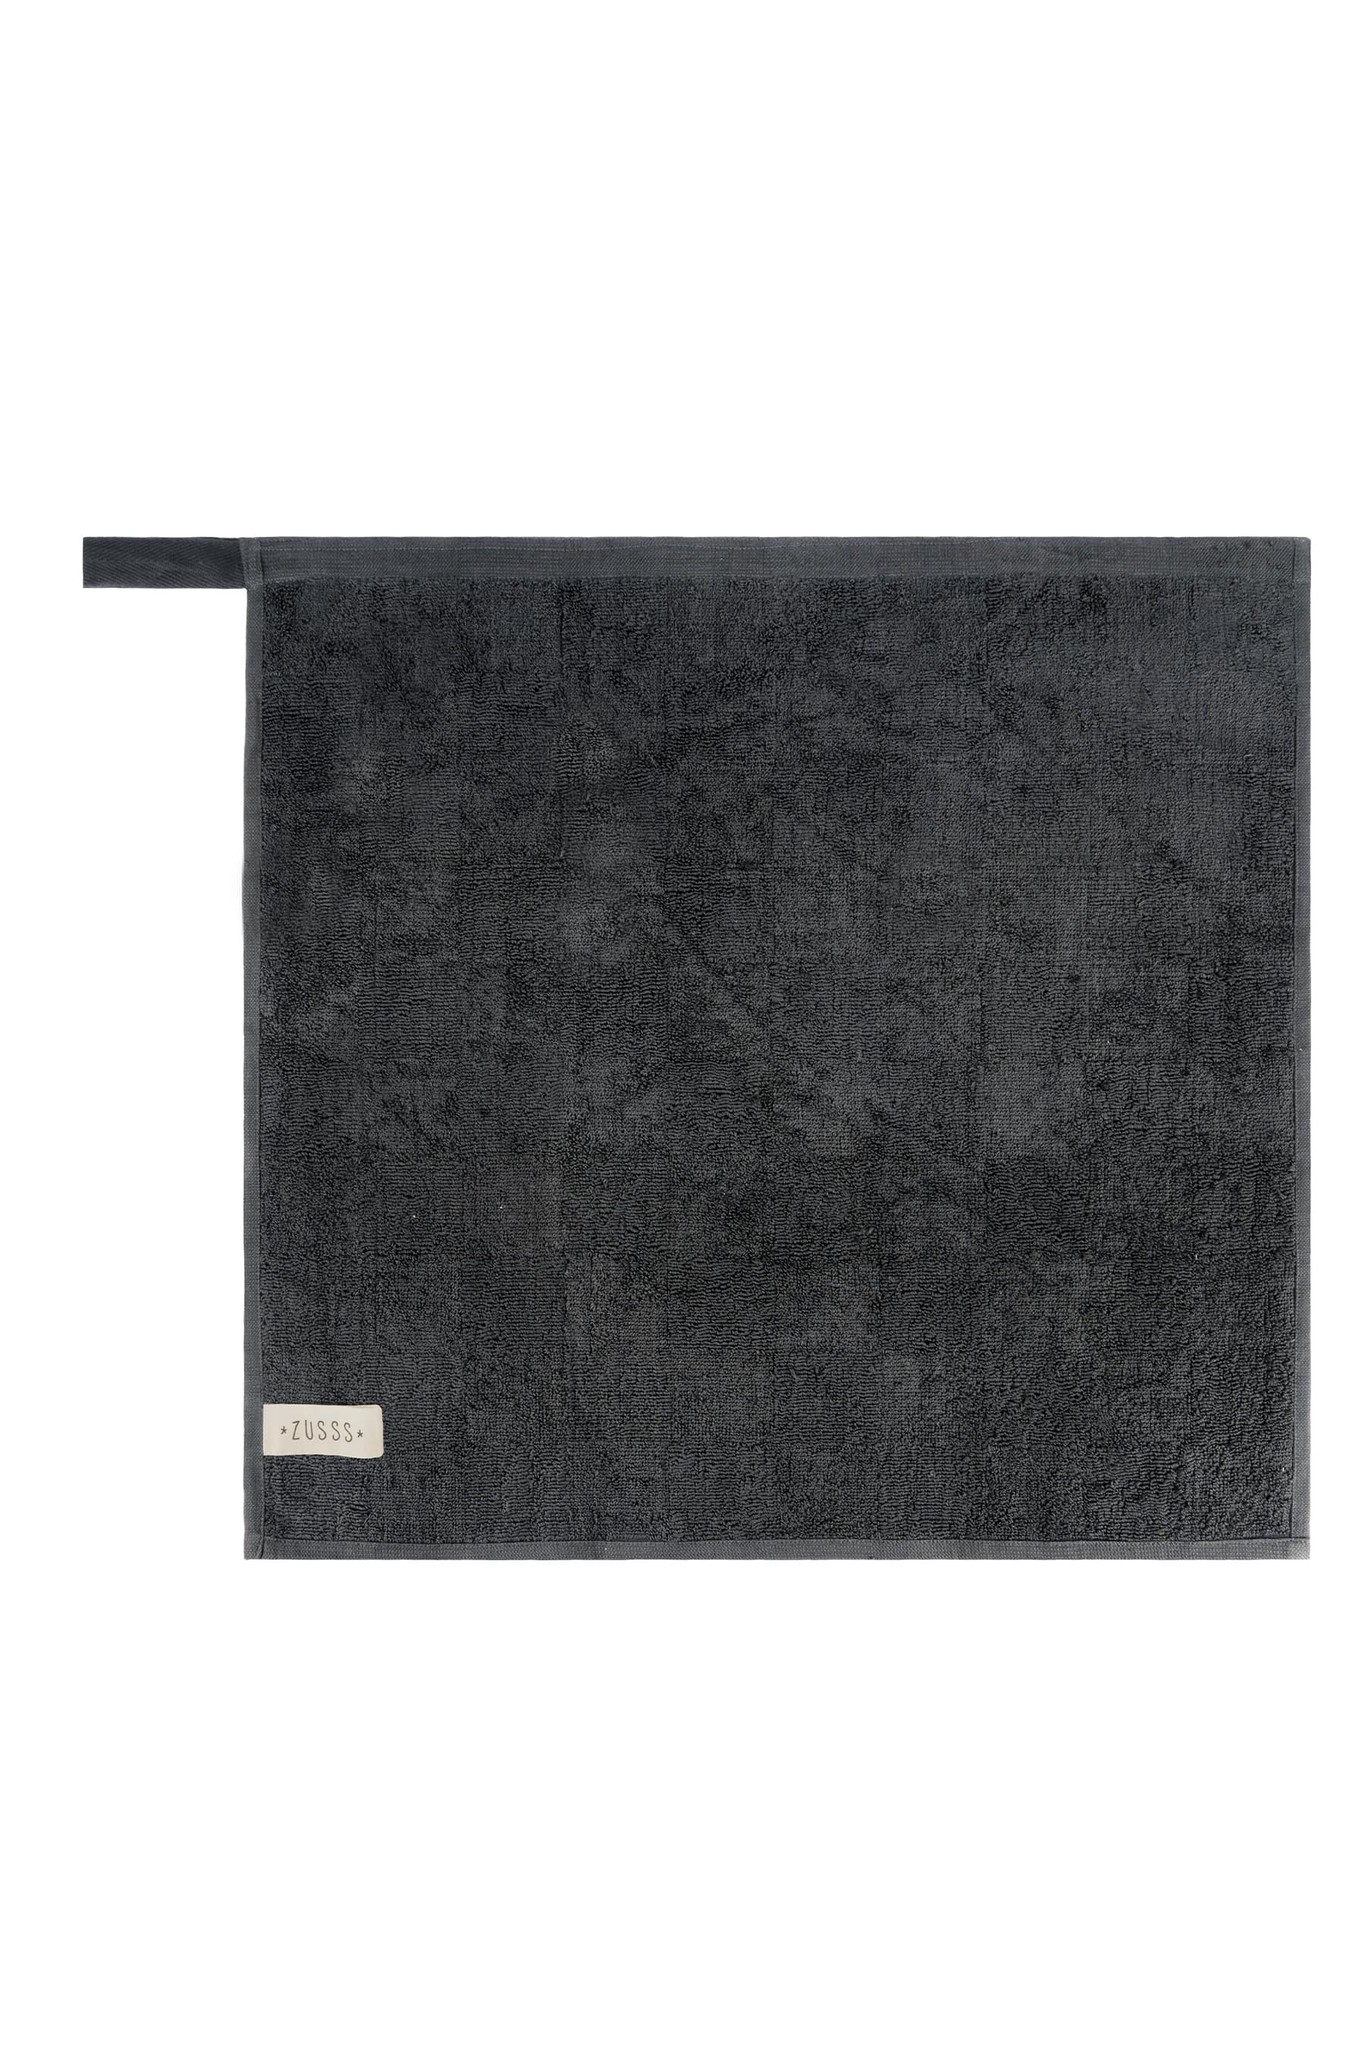 Zusss 0710-029-4500 Zusss handdoek geblokt antracietgrijs